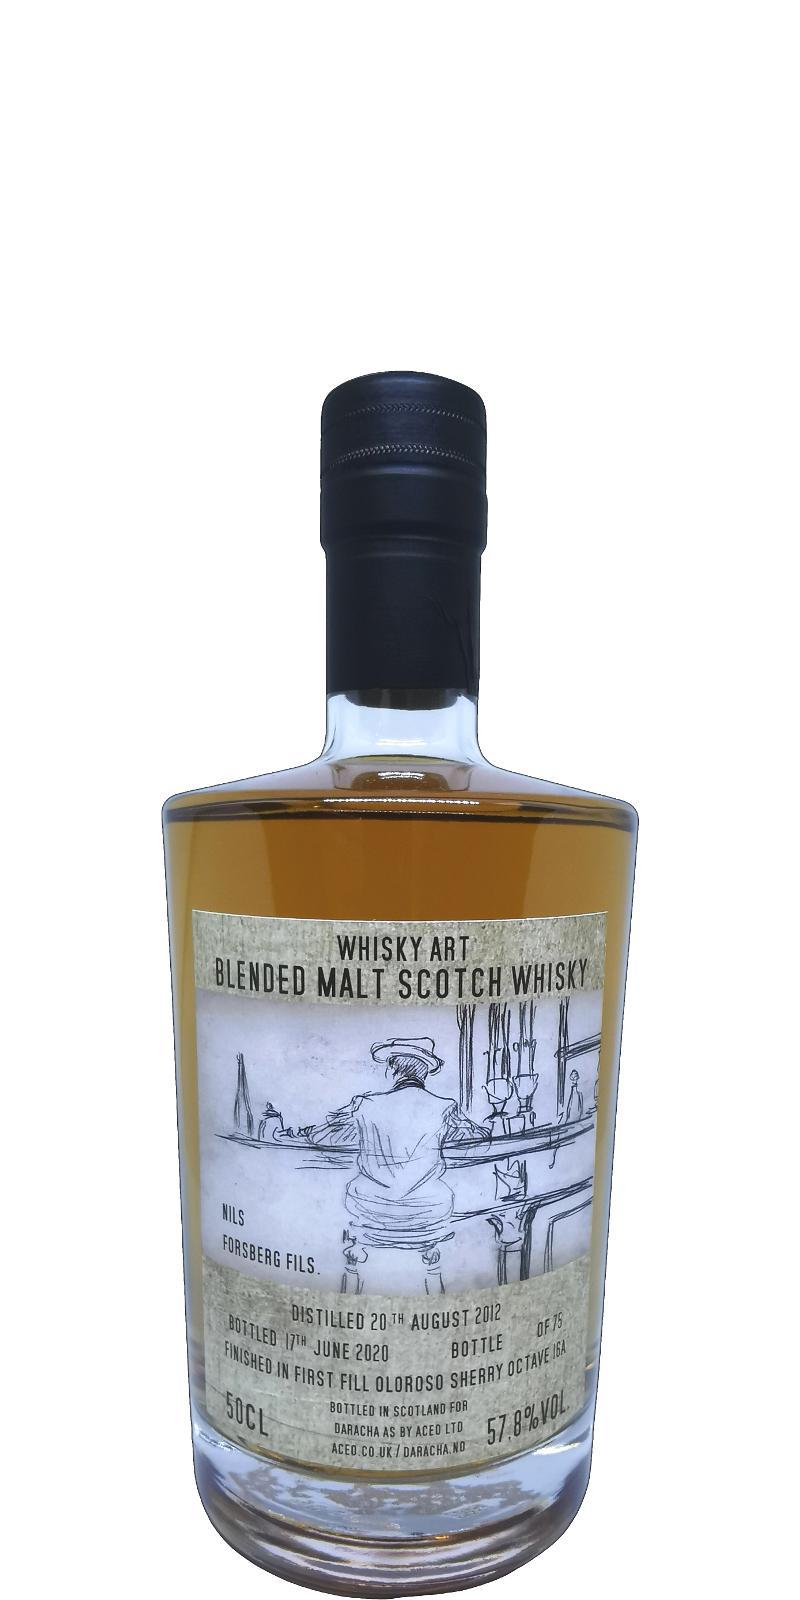 Blended Malt Scotch Whisky 2012 AcL